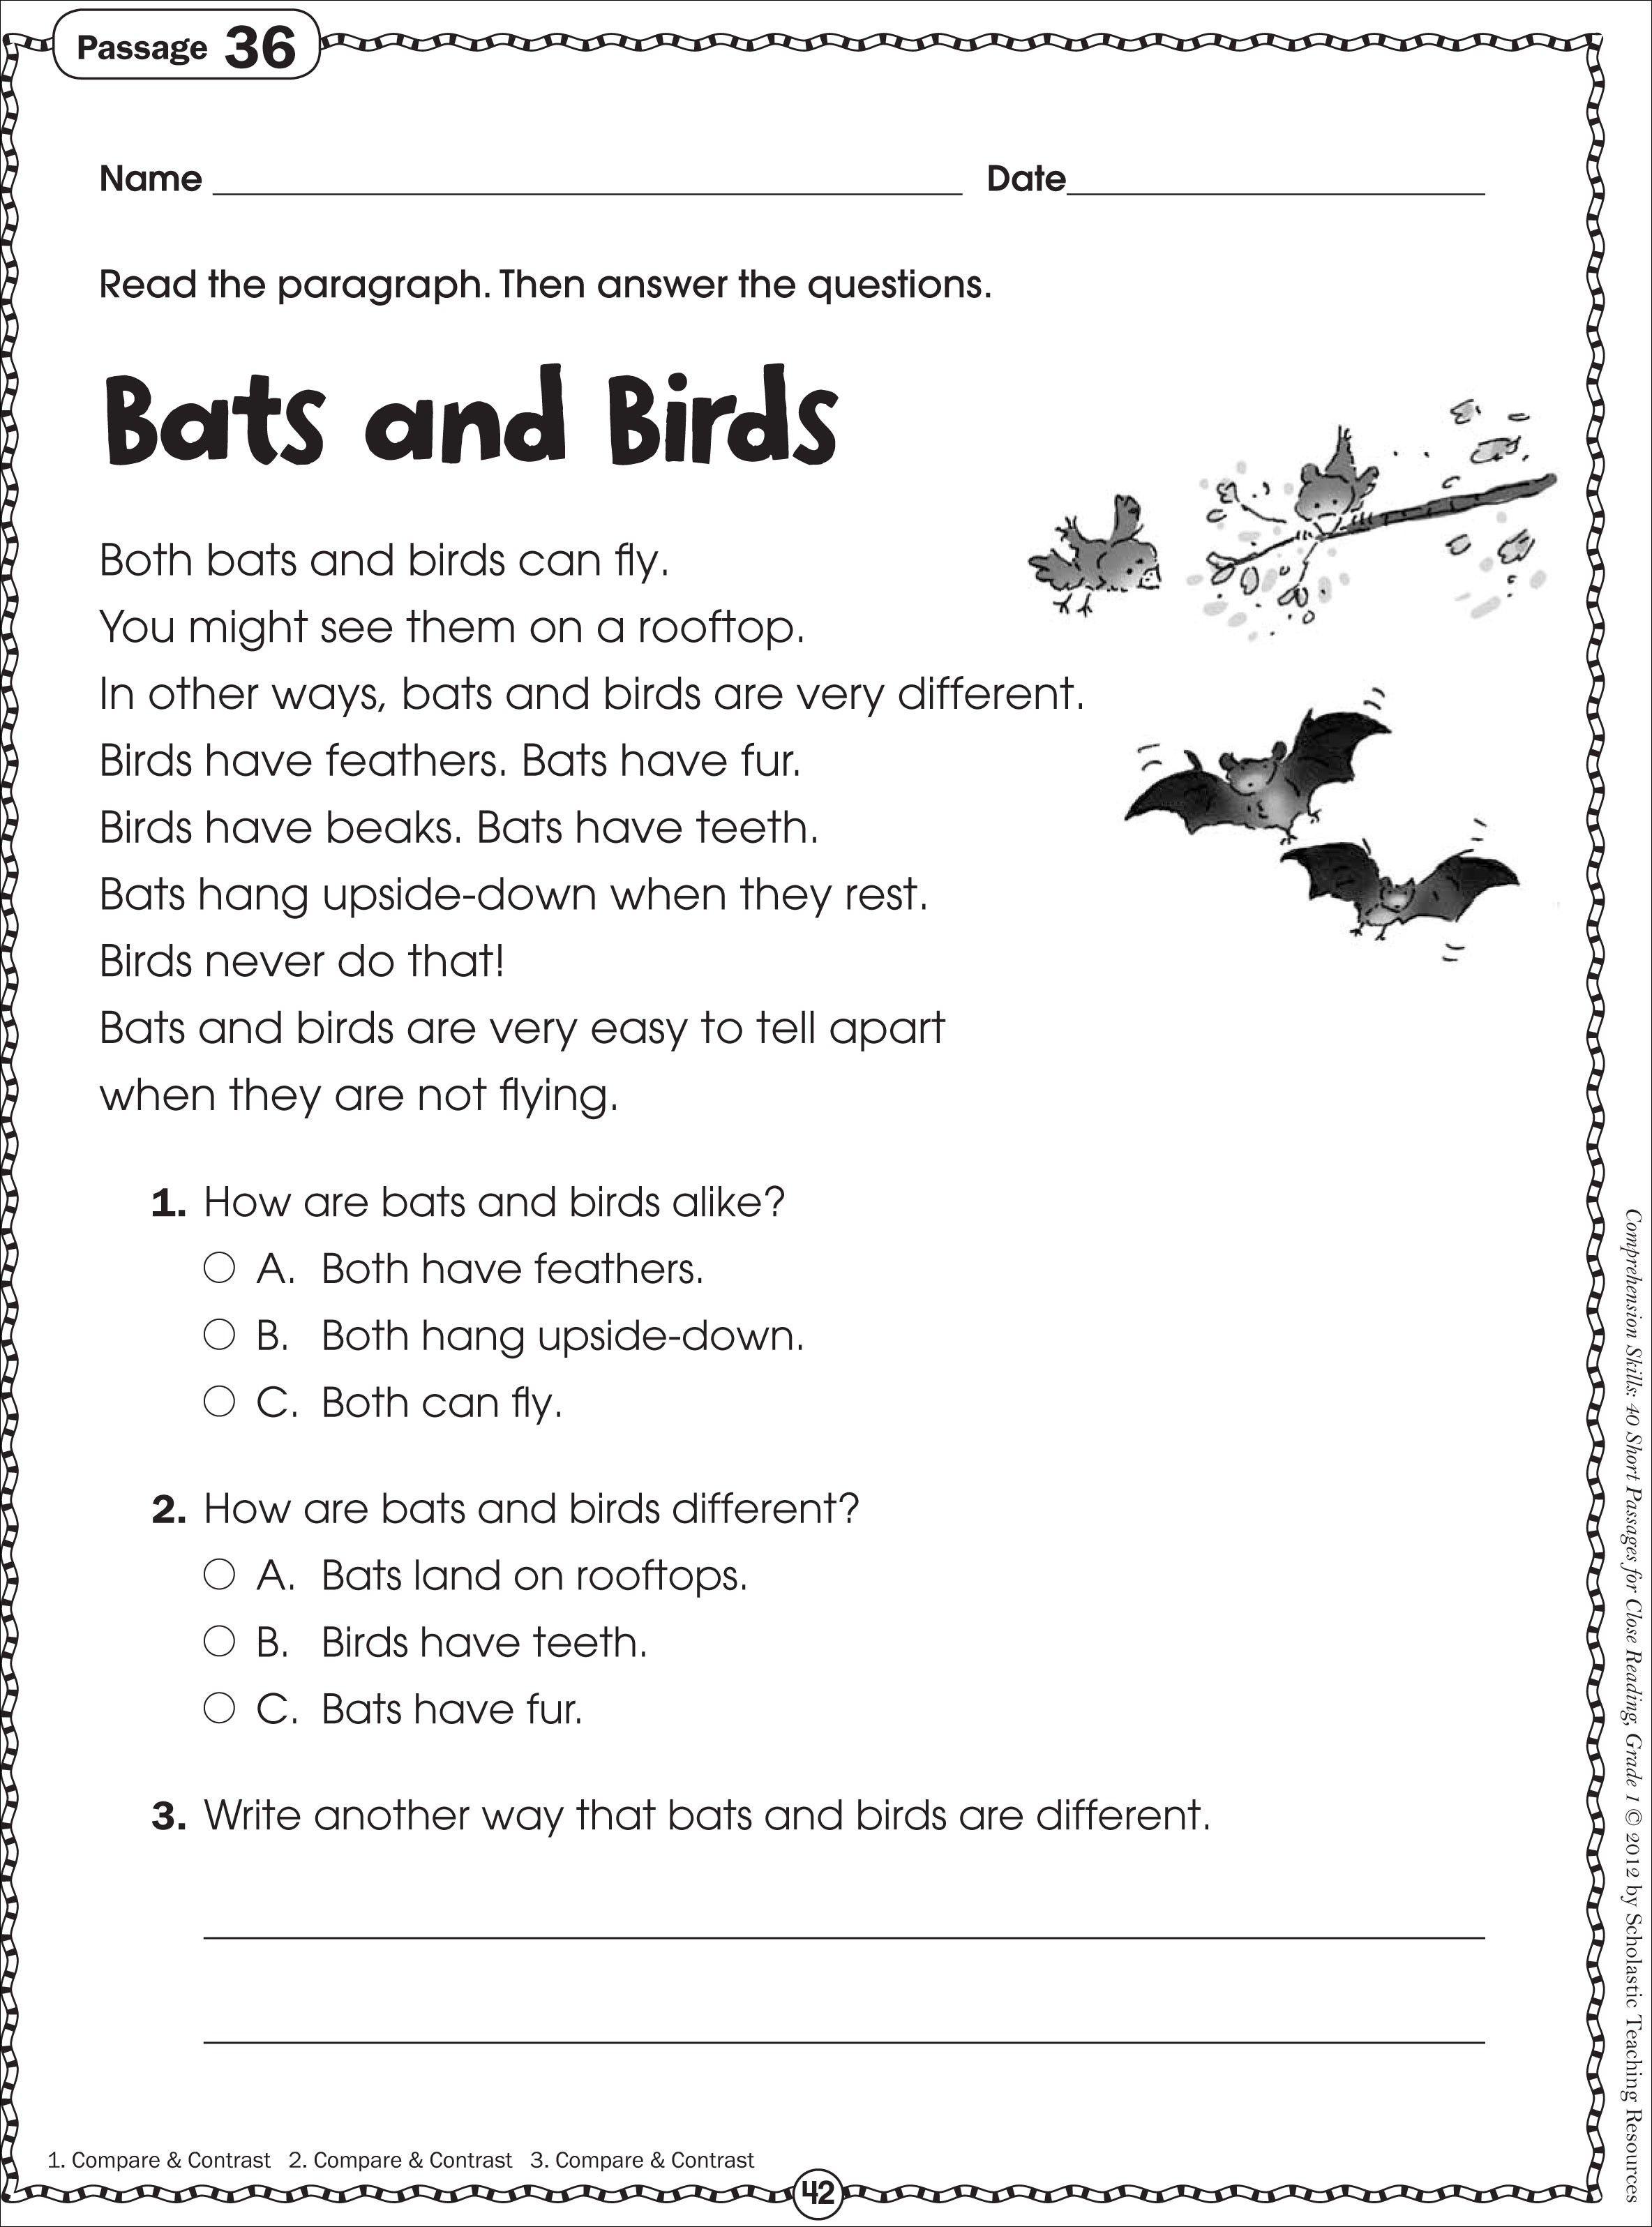 Free Printable Reading Comprehension Worksheets For Kindergarten - Free Printable Reading Comprehension Worksheets